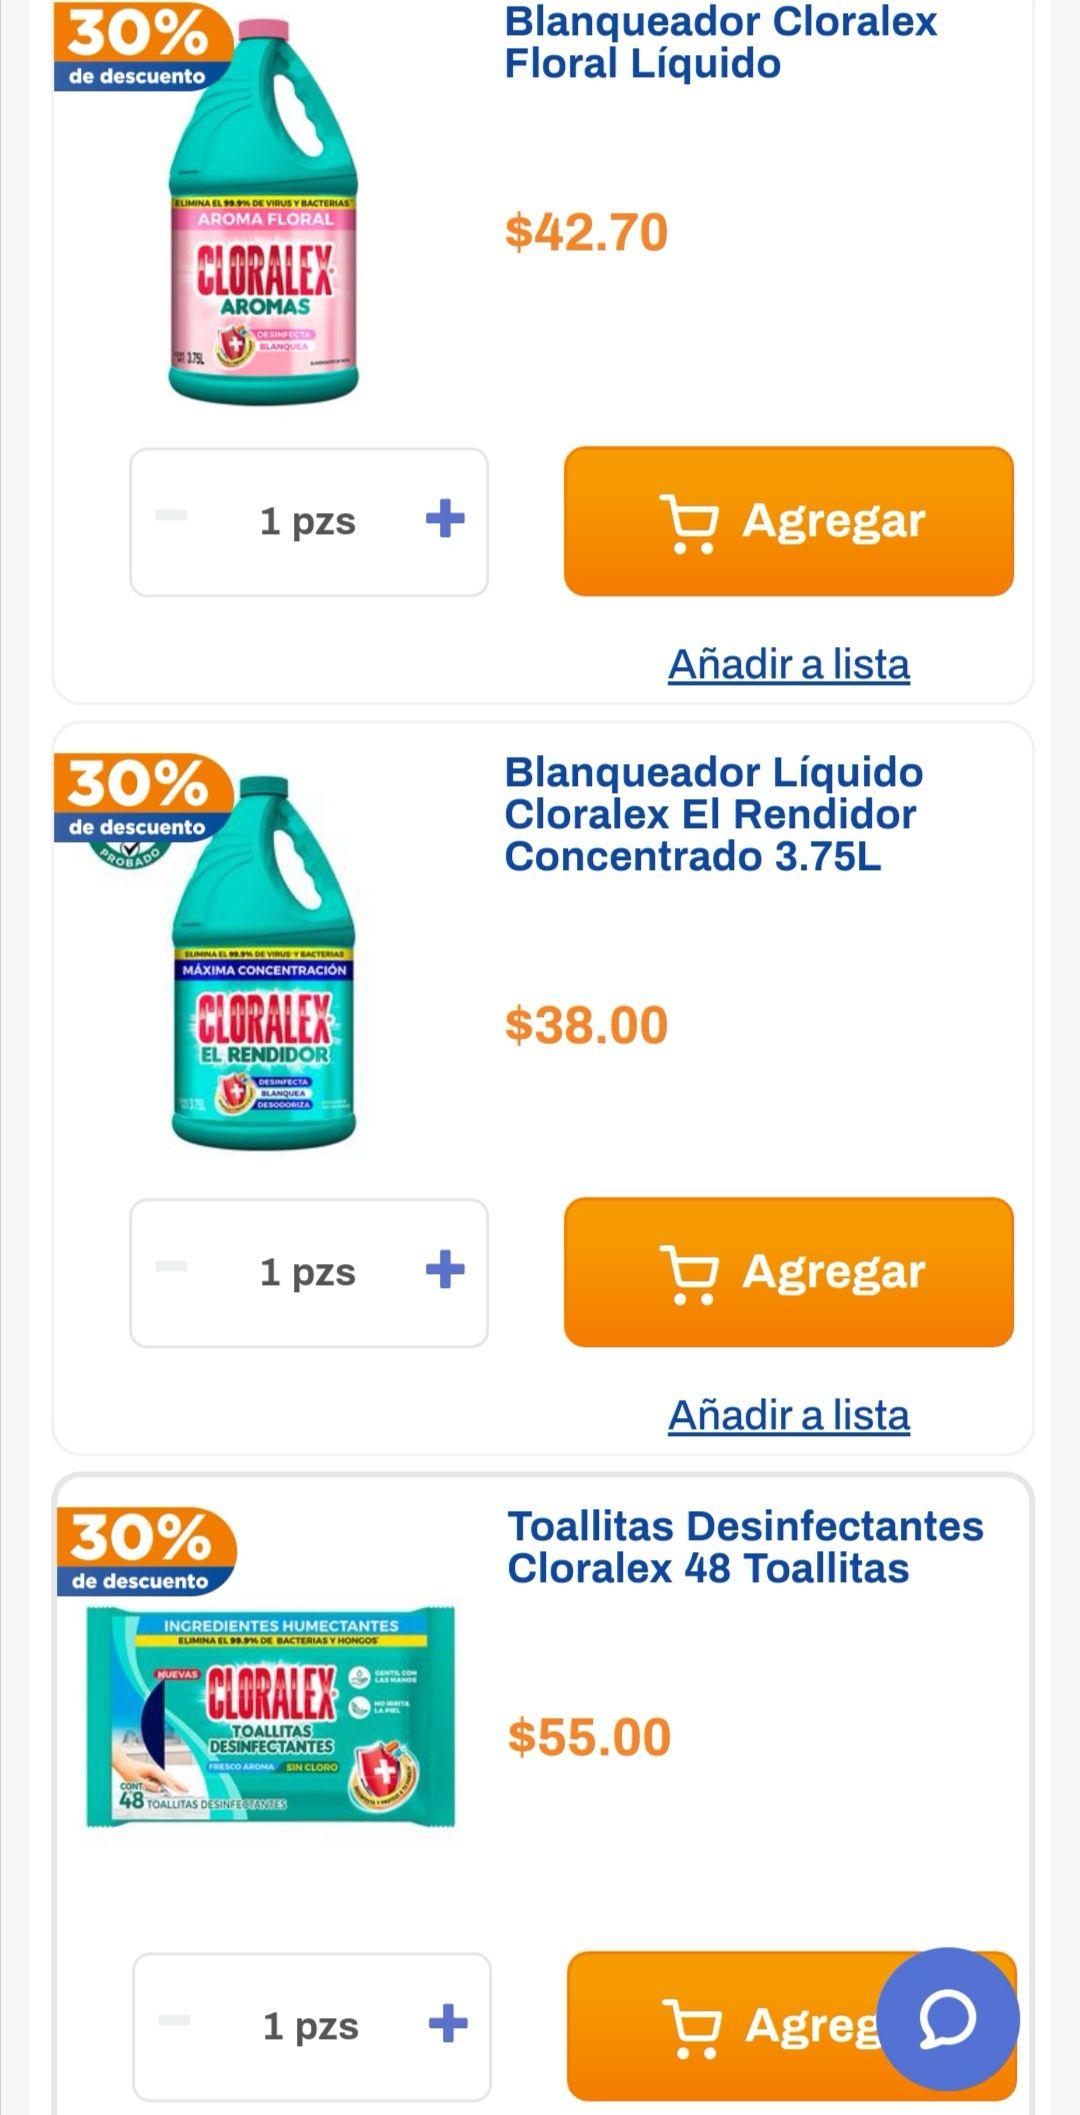 Chedraui: 30% de descuento en blanqueadores Cloralex 3.75 L y toallitas desinfectantes Cloralex 48 pzs